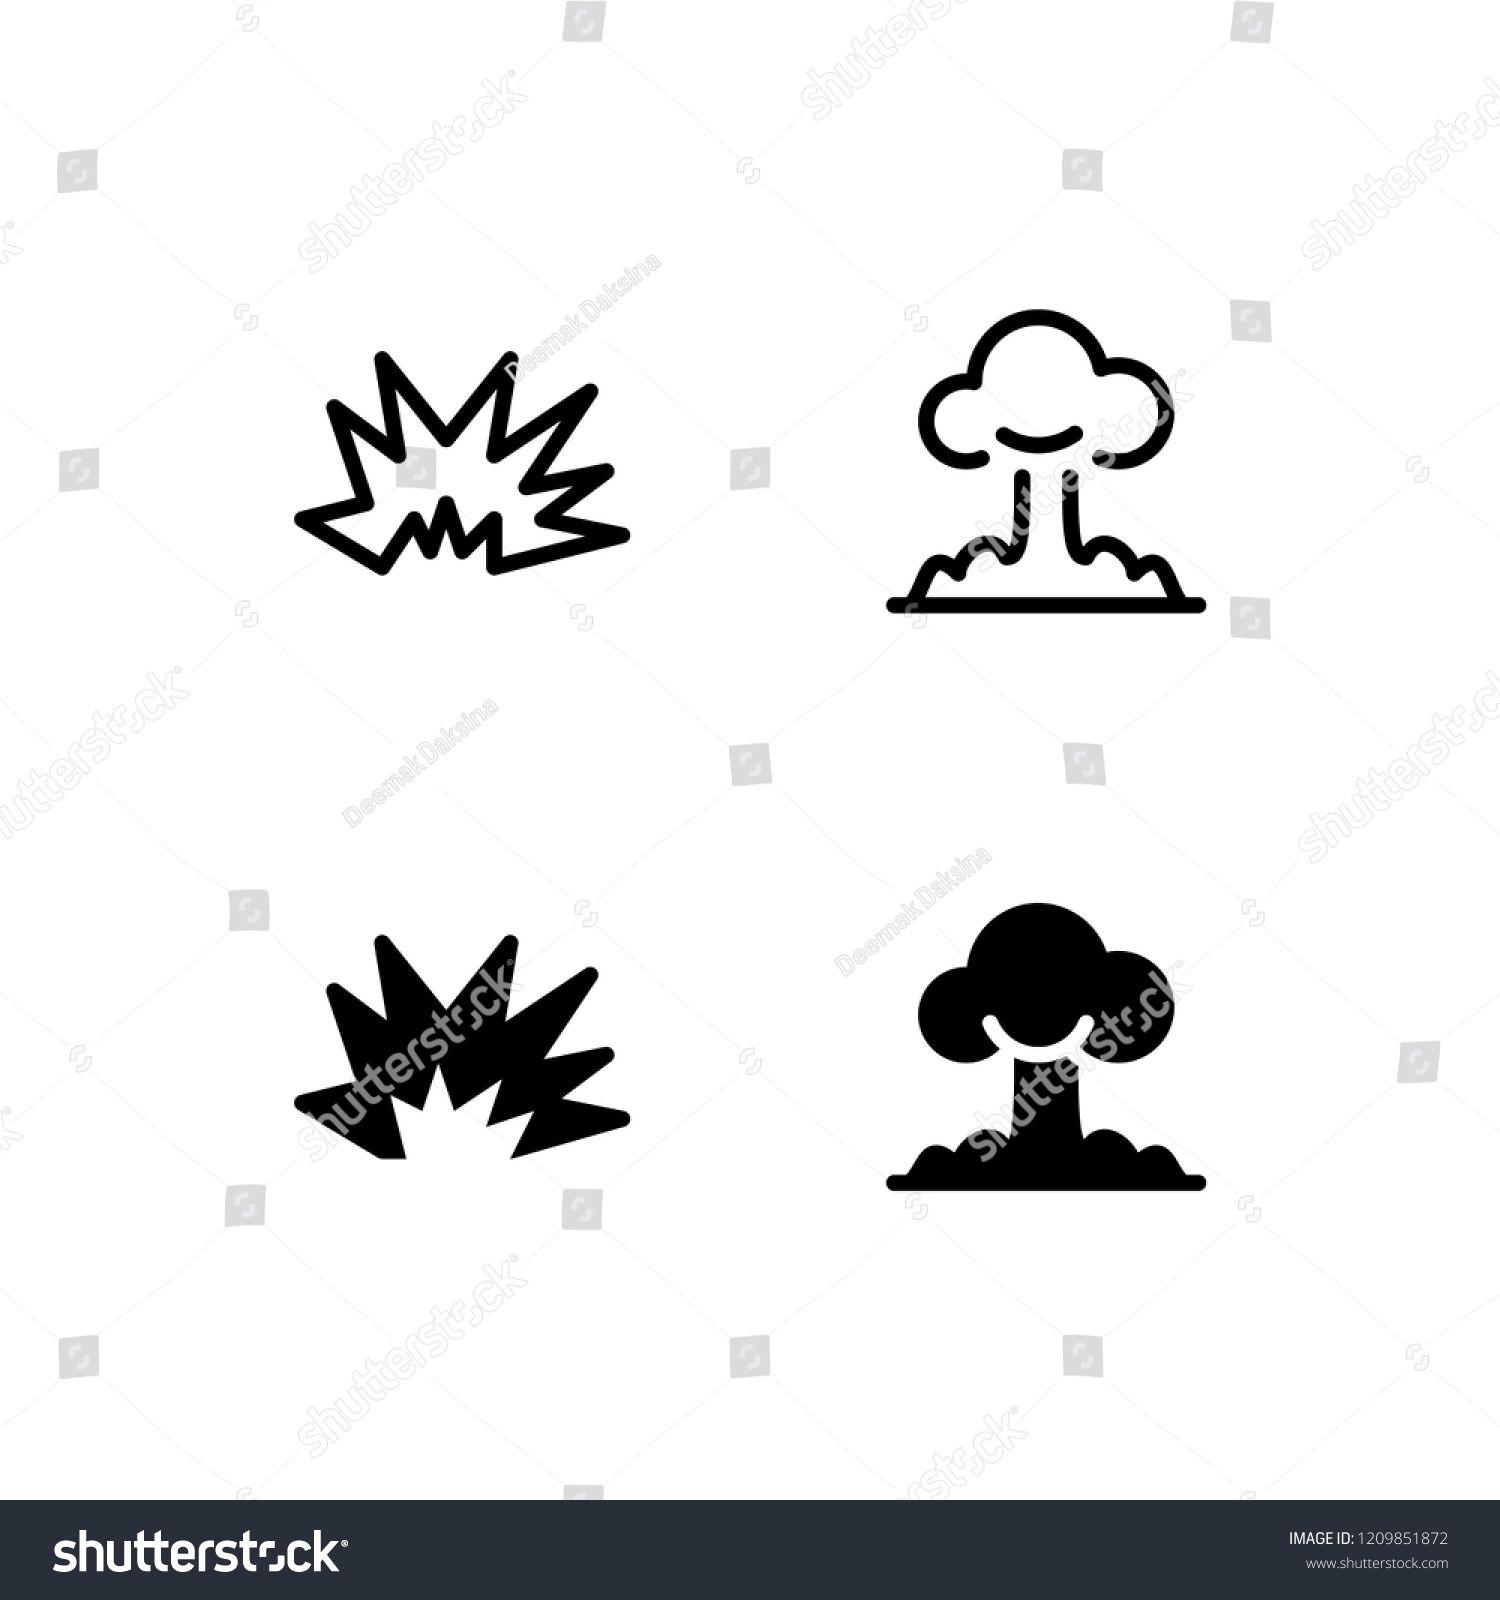 Atomic Bombings Of Hiroshima And Nagasaki Nuclear Weapon Mushroom Cloud Nuclear Explosion Atomic Bombings Of Hiroshima And Nagasaki Hiroshima Bombing Explosion